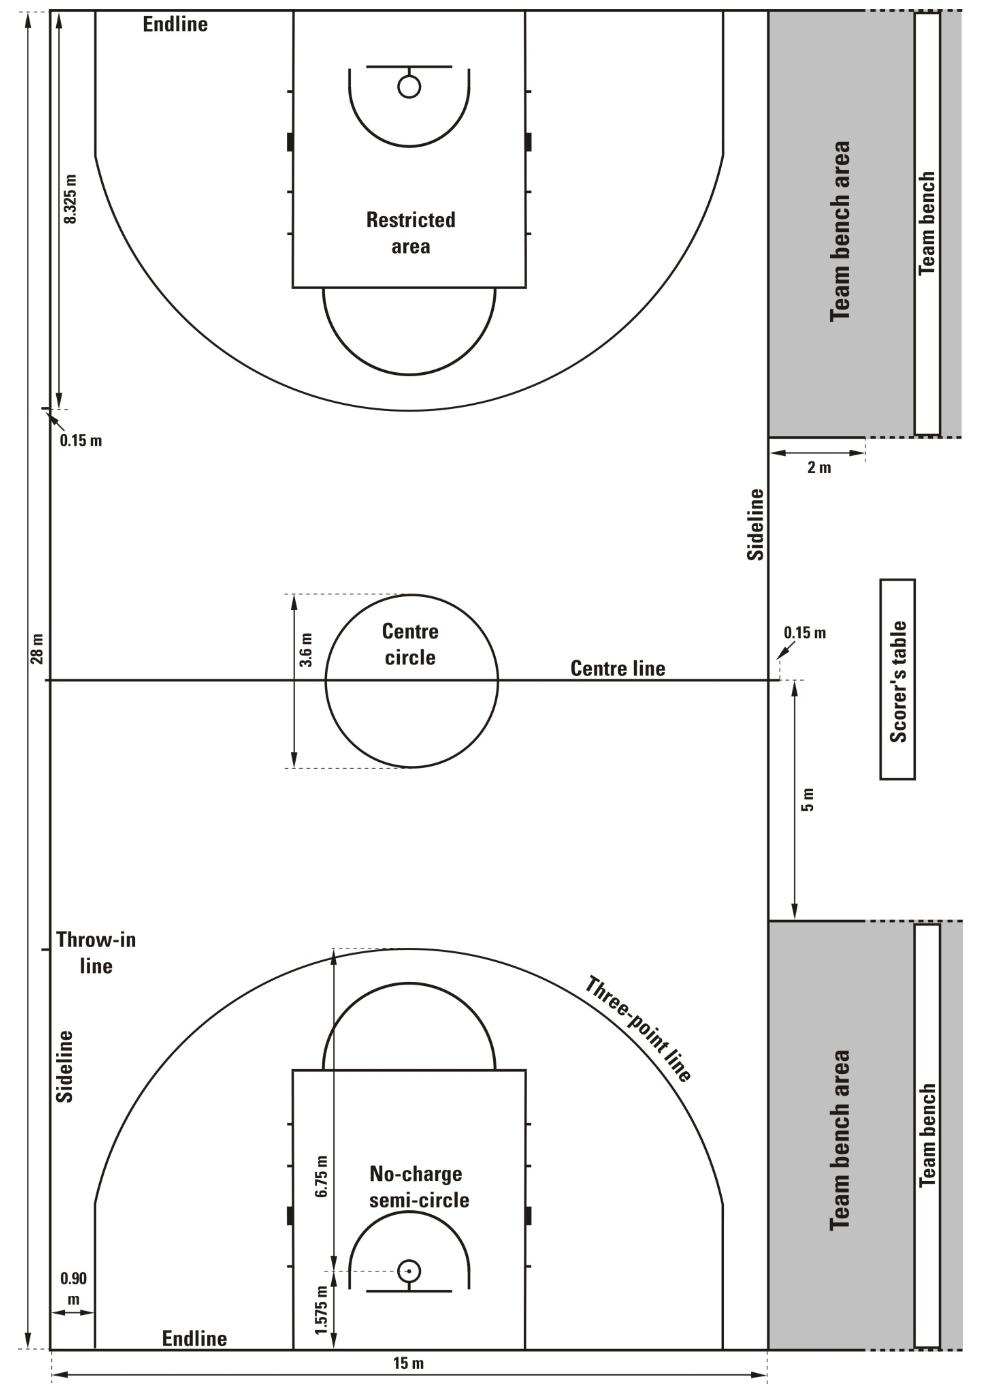 Ukuran Lapangan Bola Basket & Tinggi Ring Gambar [LENGKAP]